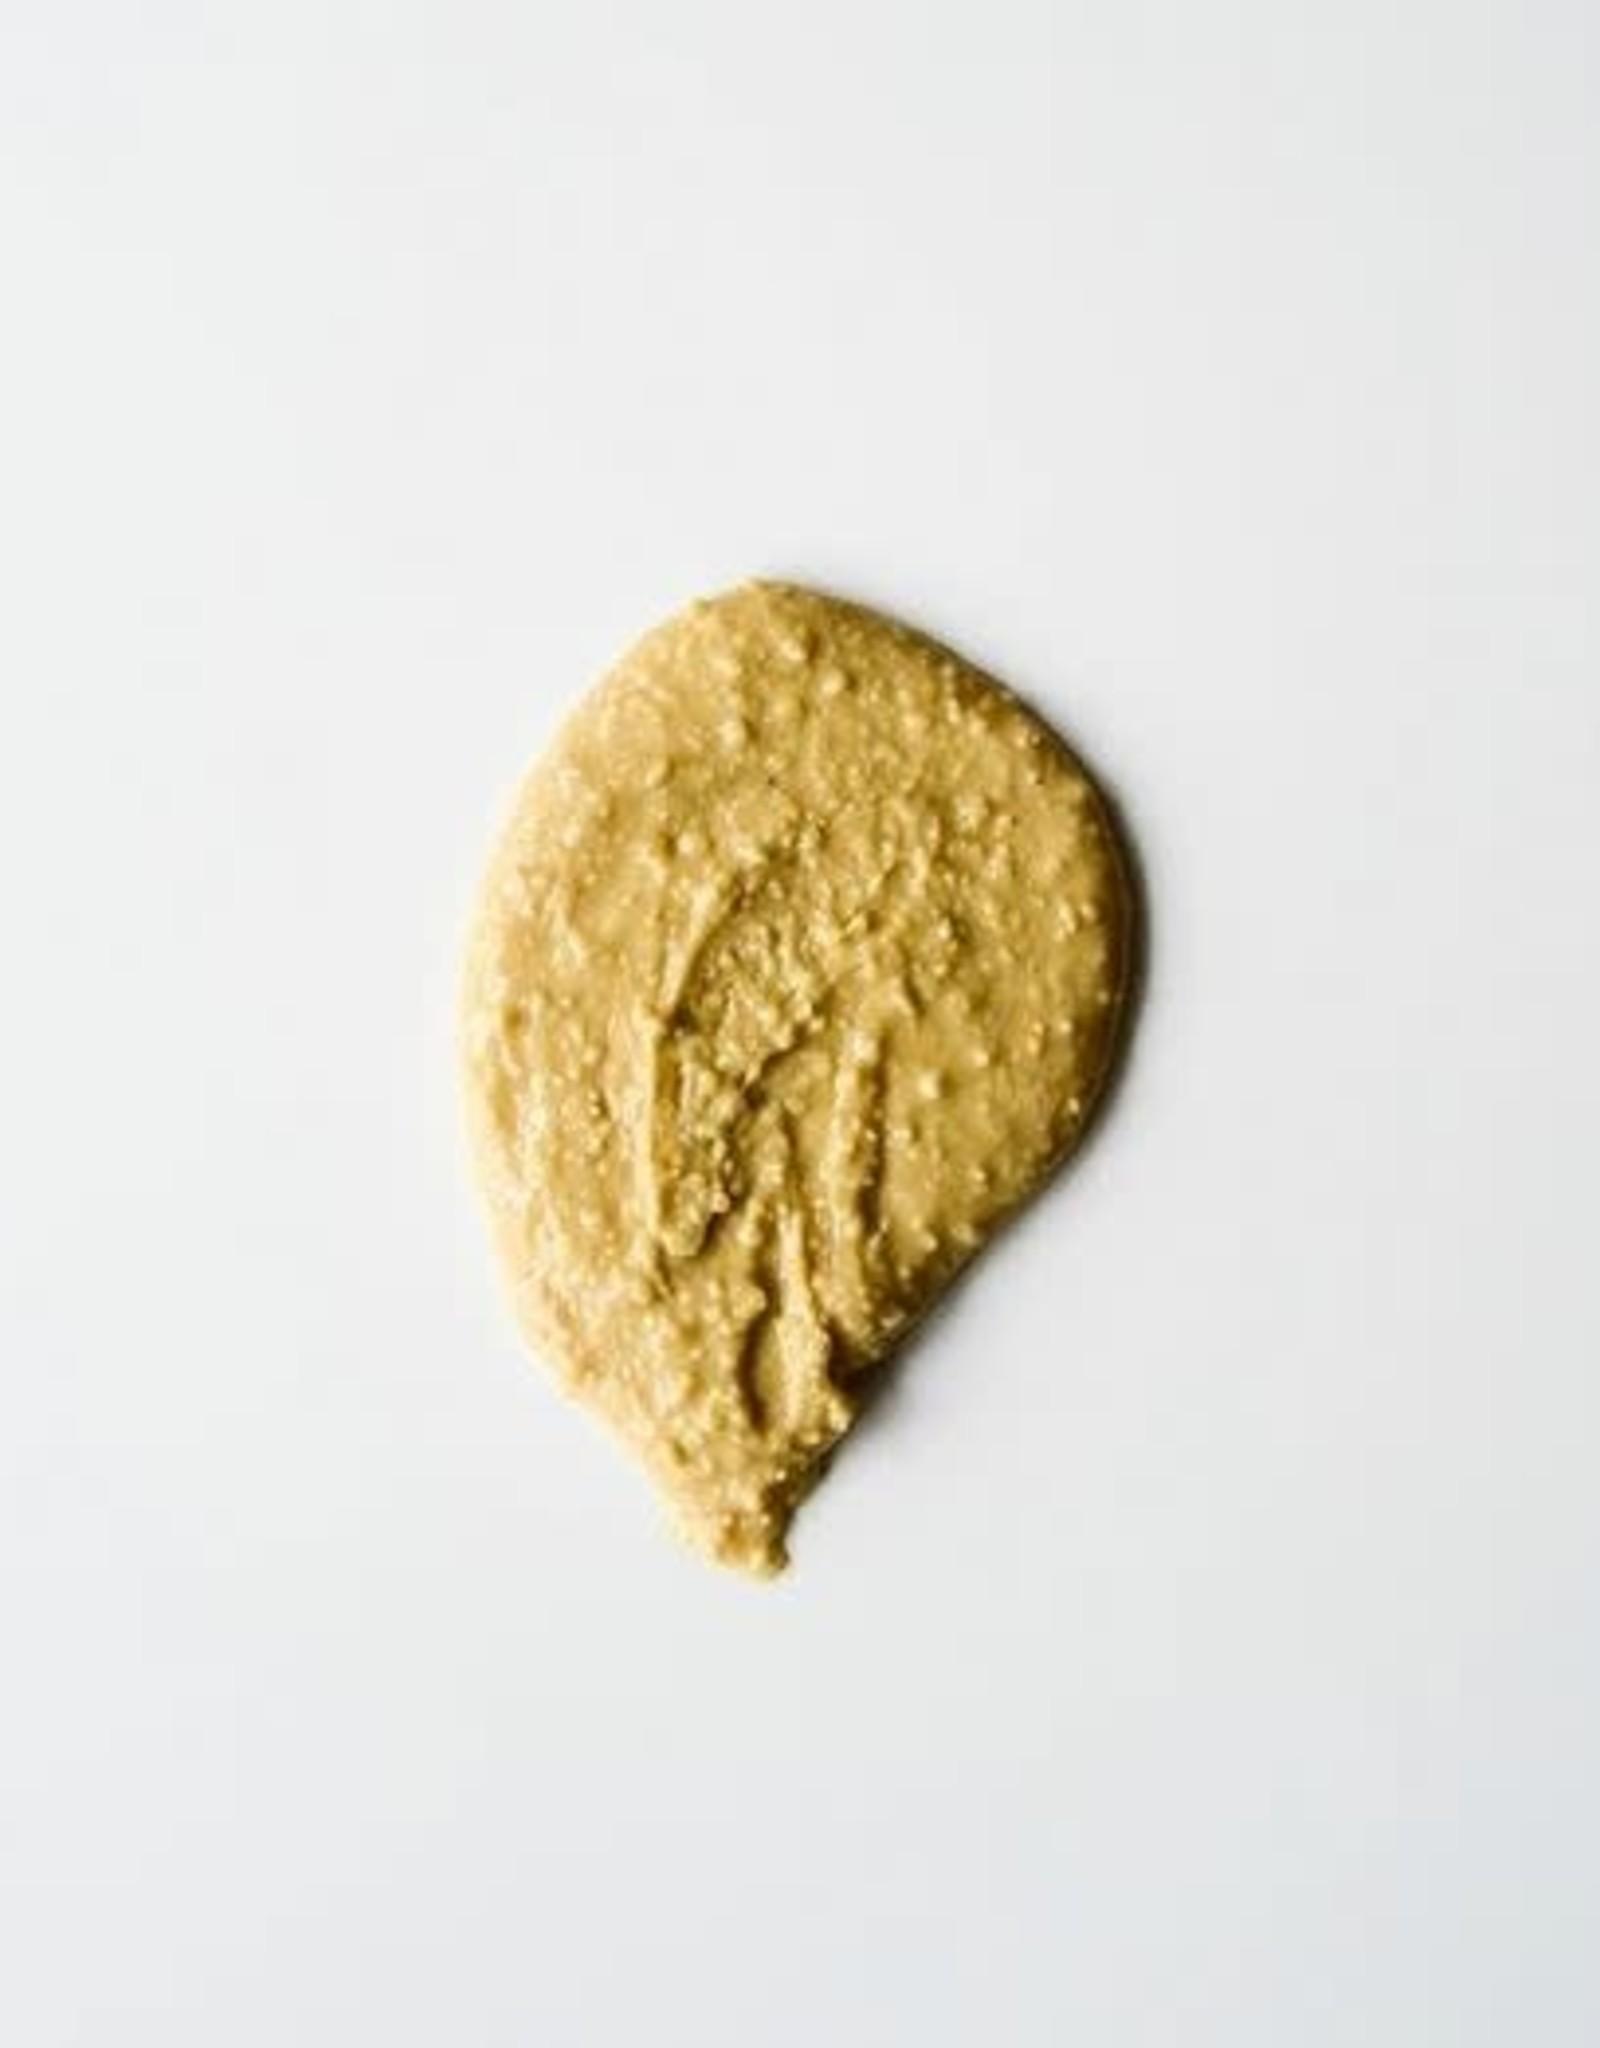 Logan Petit Lot Maple & Sea Salt Peanut Butter